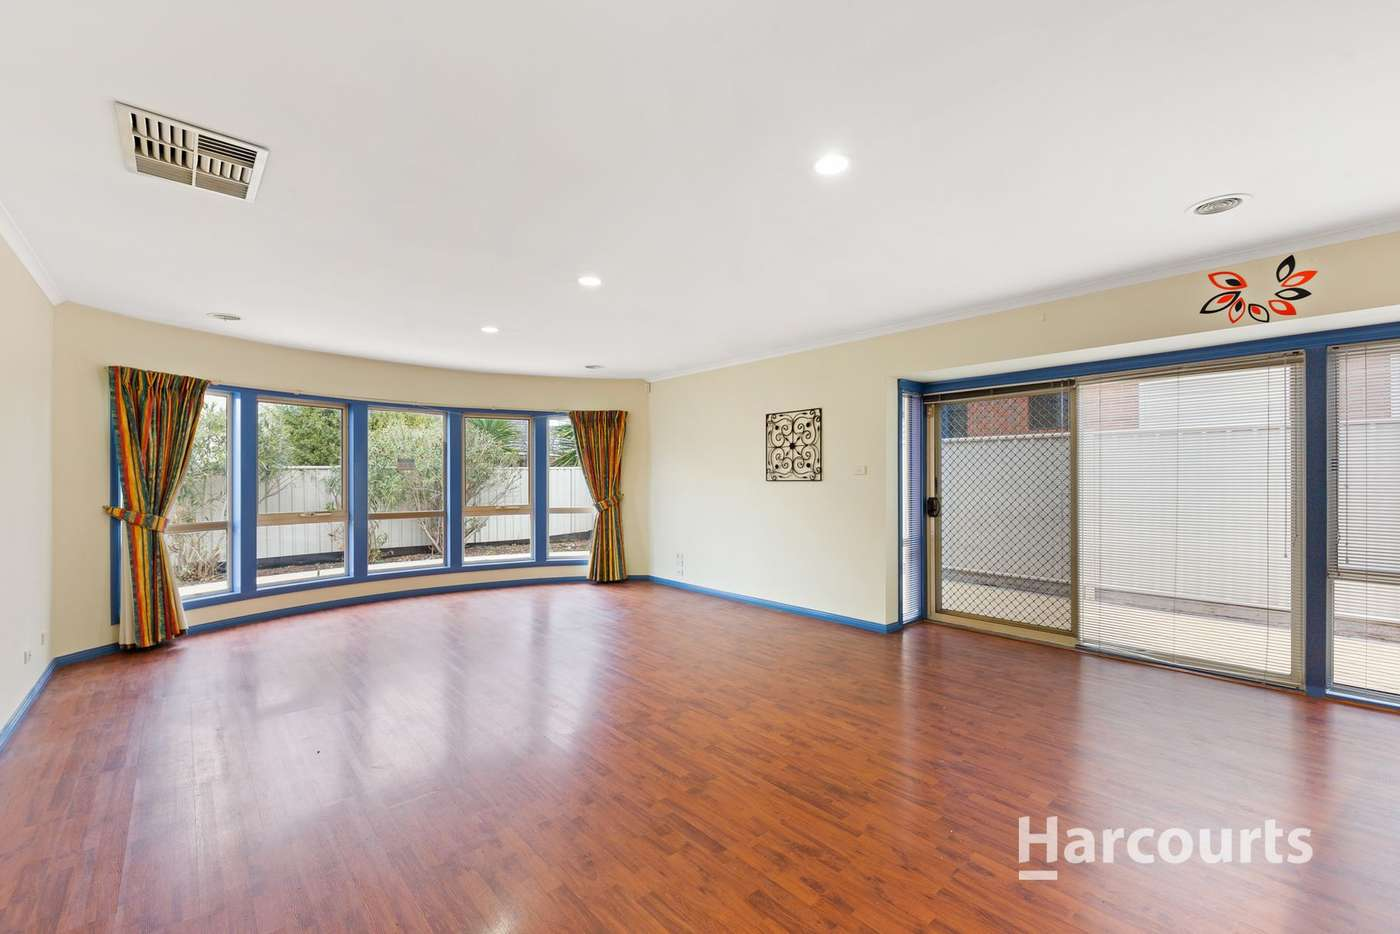 Sixth view of Homely house listing, 3 Bendigo Circuit, Caroline Springs VIC 3023